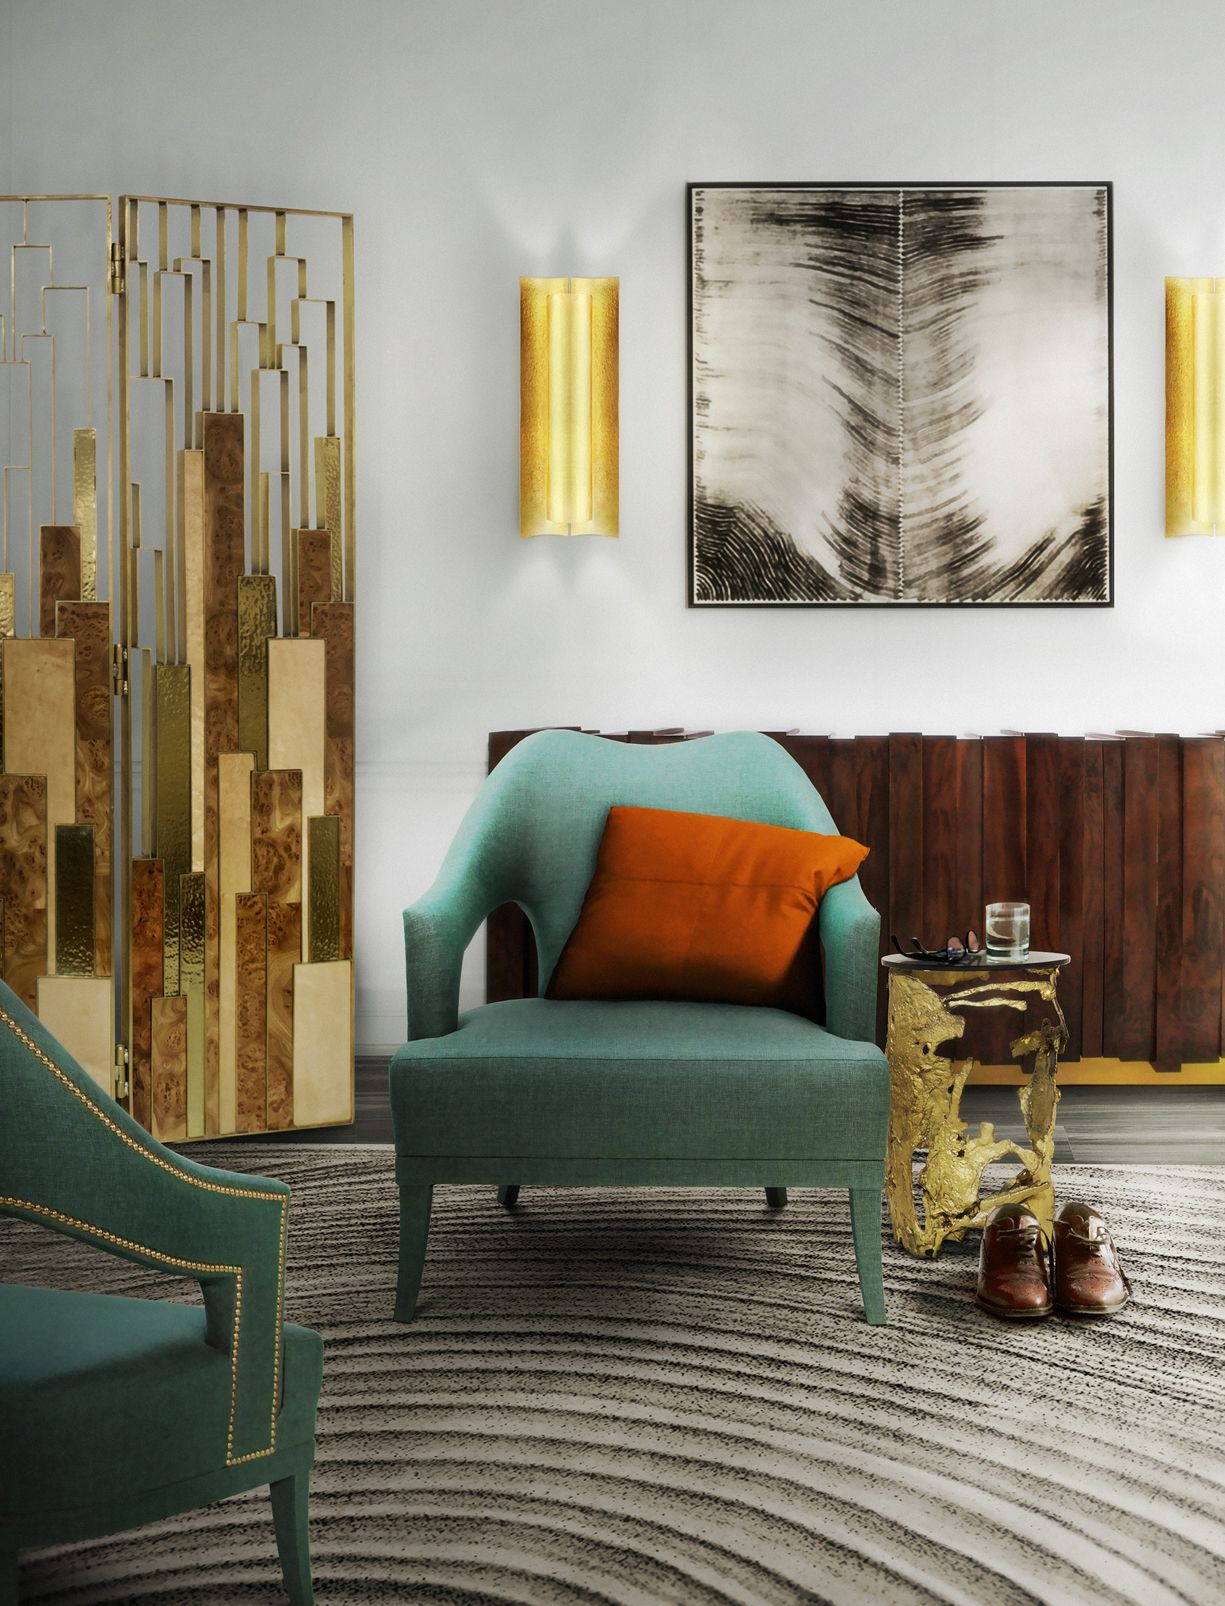 Design Chairs For Living Room Impressive Davis Bar Chair Mid Century Modern Designbrabbu Is Easily 2018